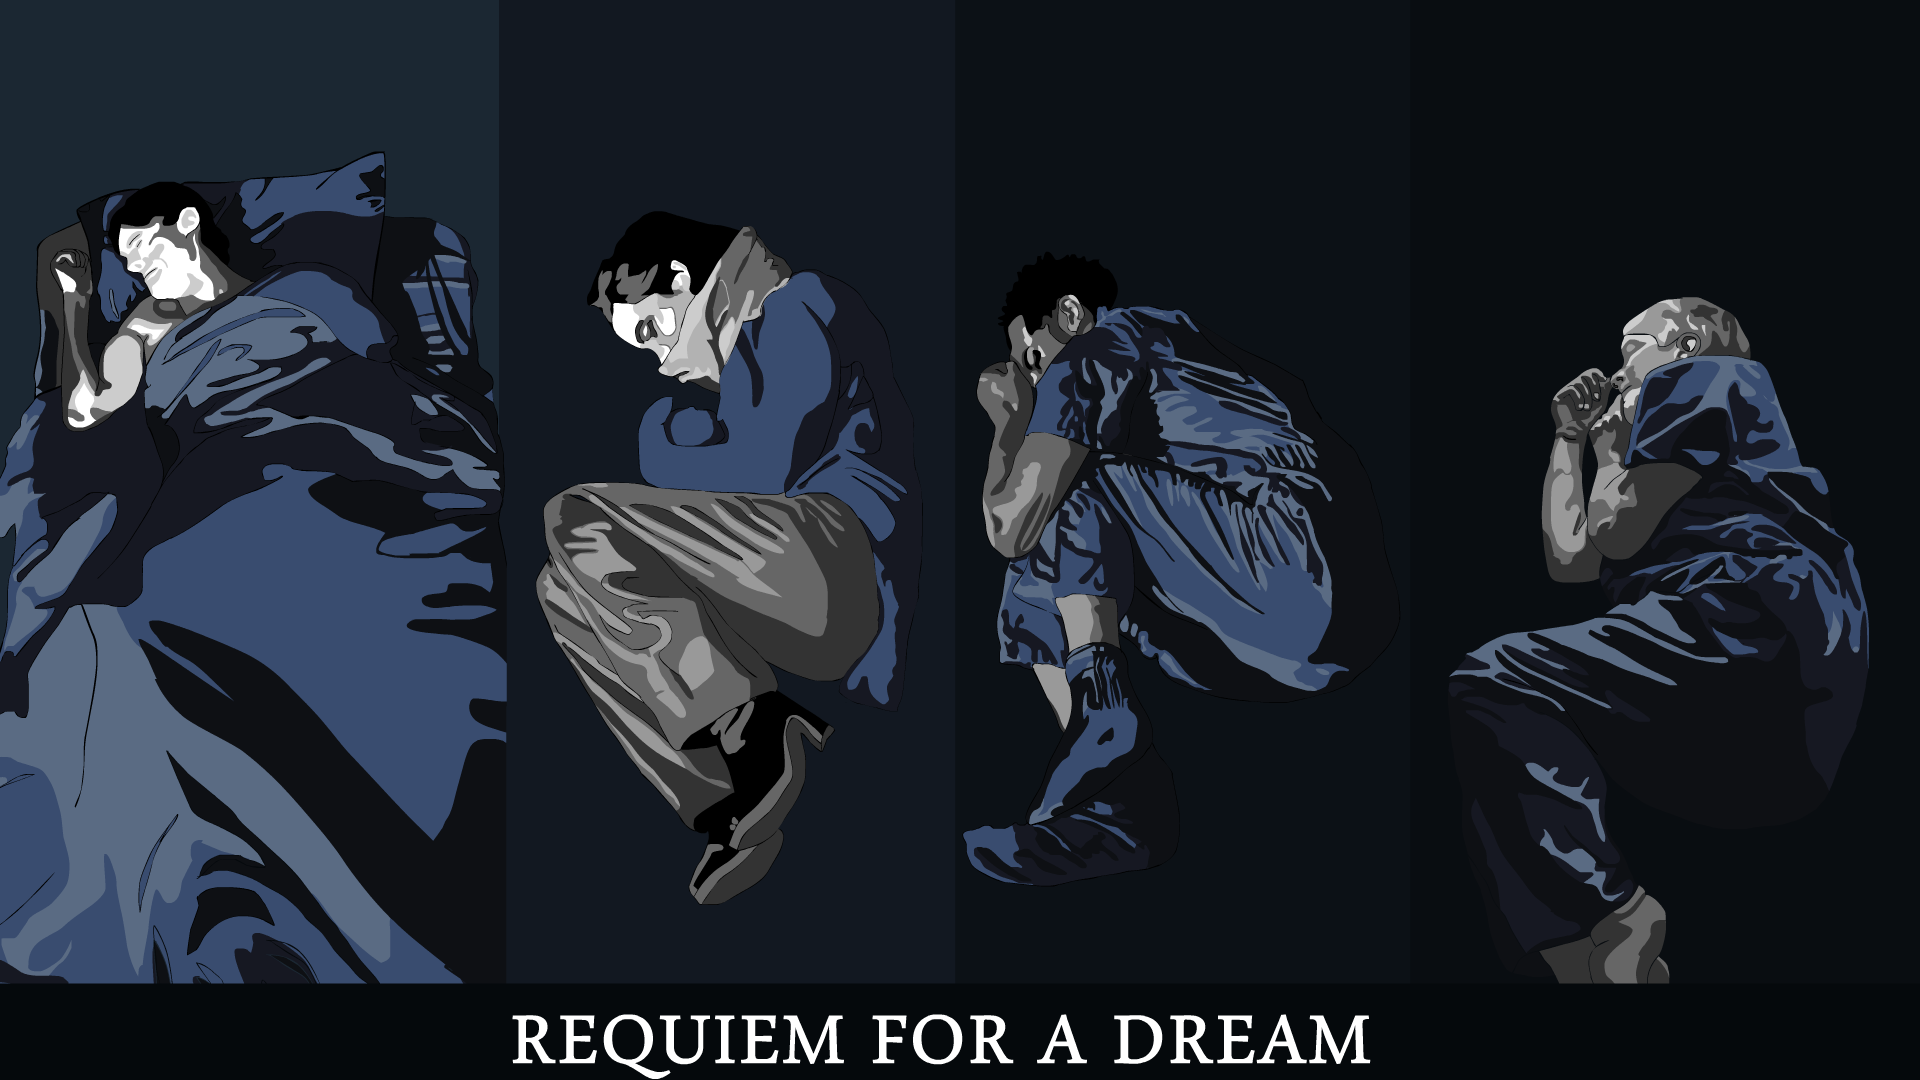 Requiem For A Dream Poster By Charlesjimenez On Deviantart